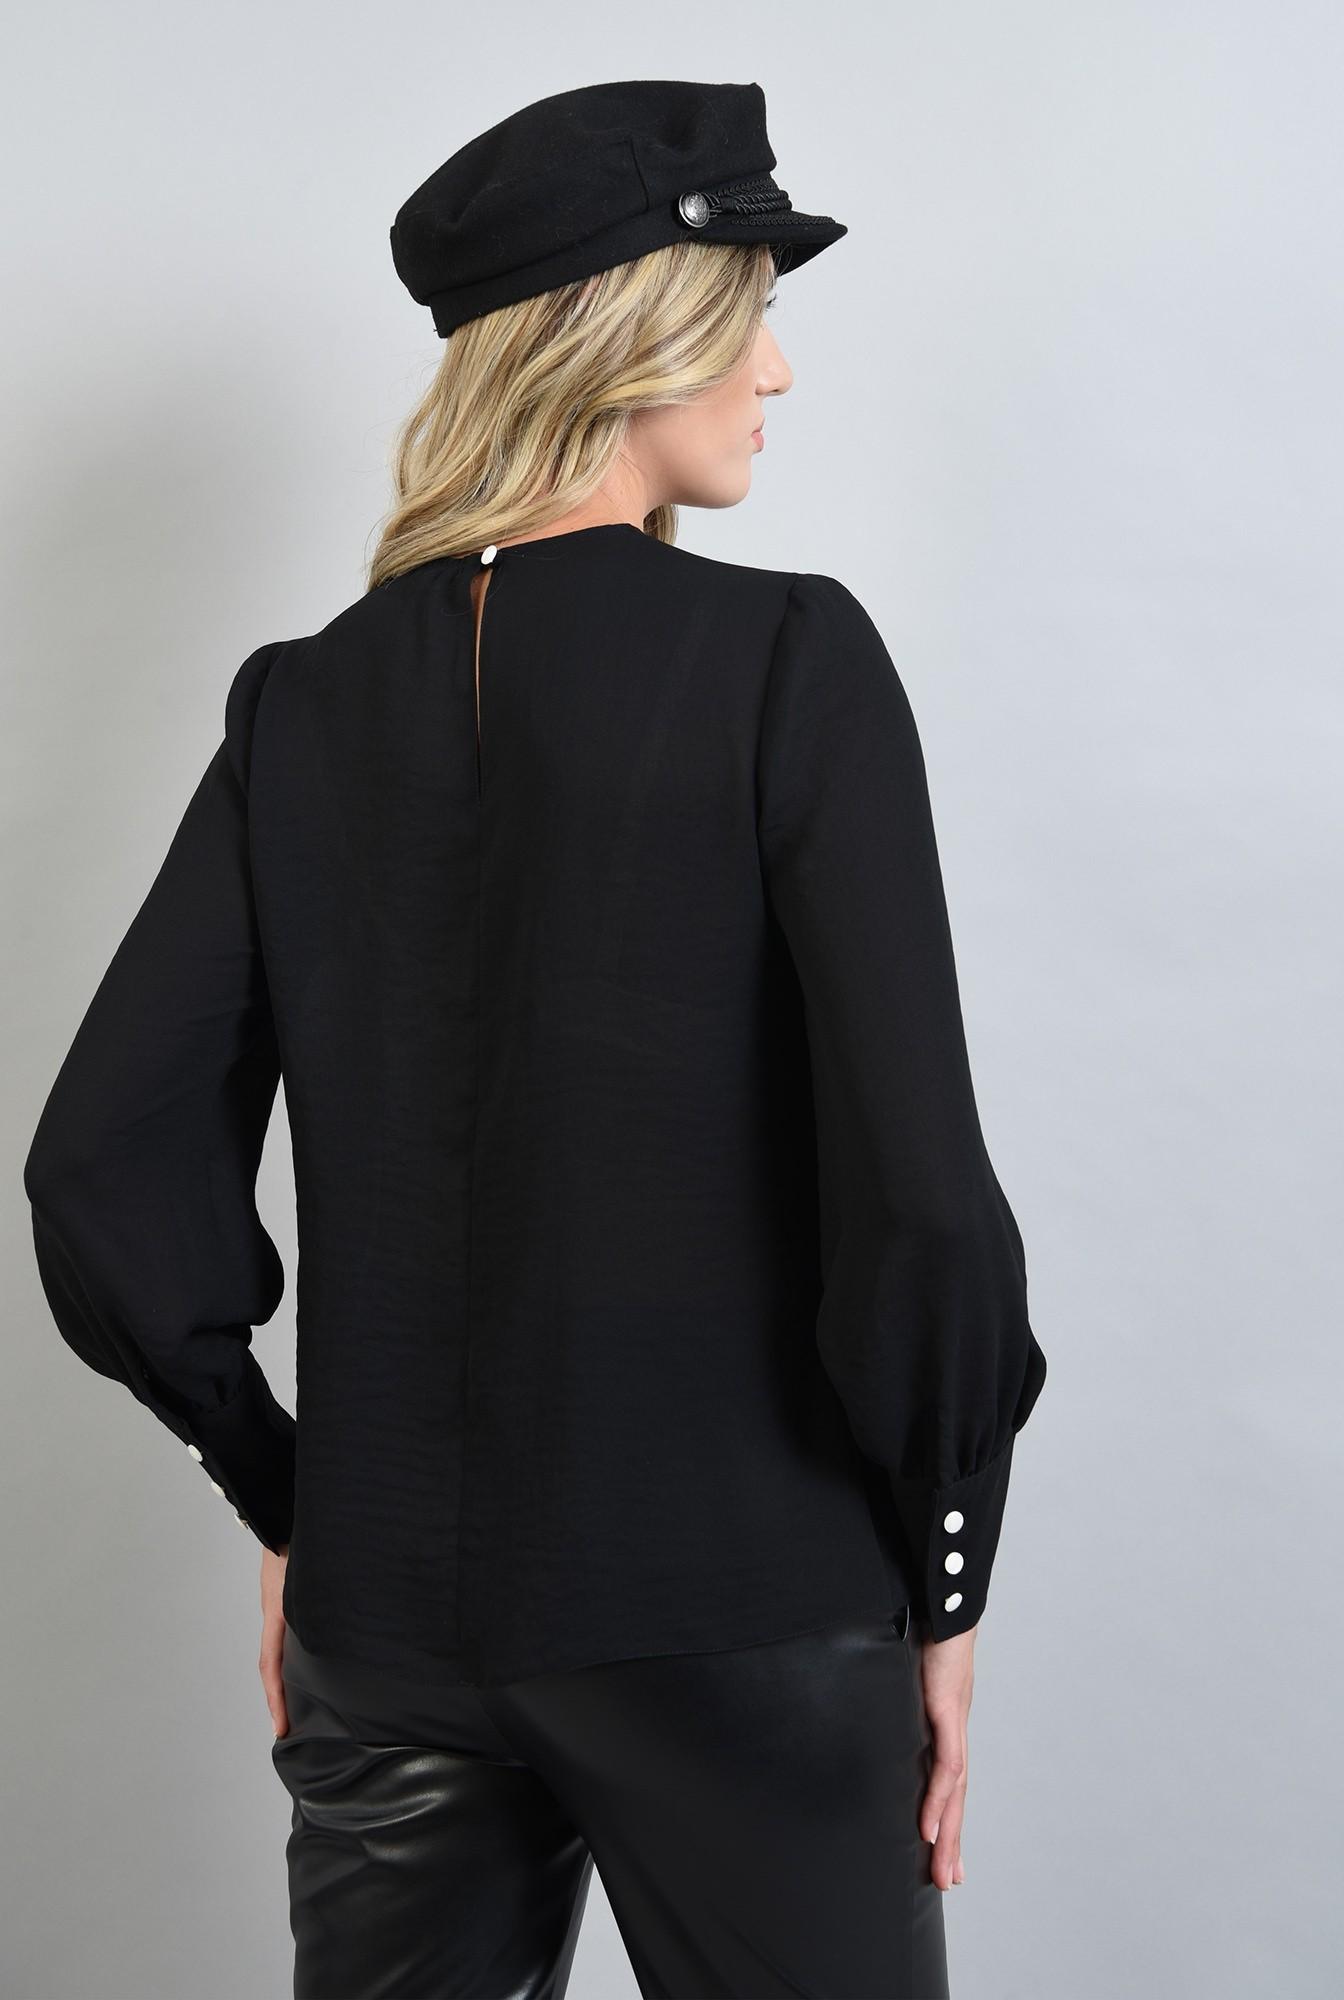 1 - bluza neagra, lejera, cu maneca lunga